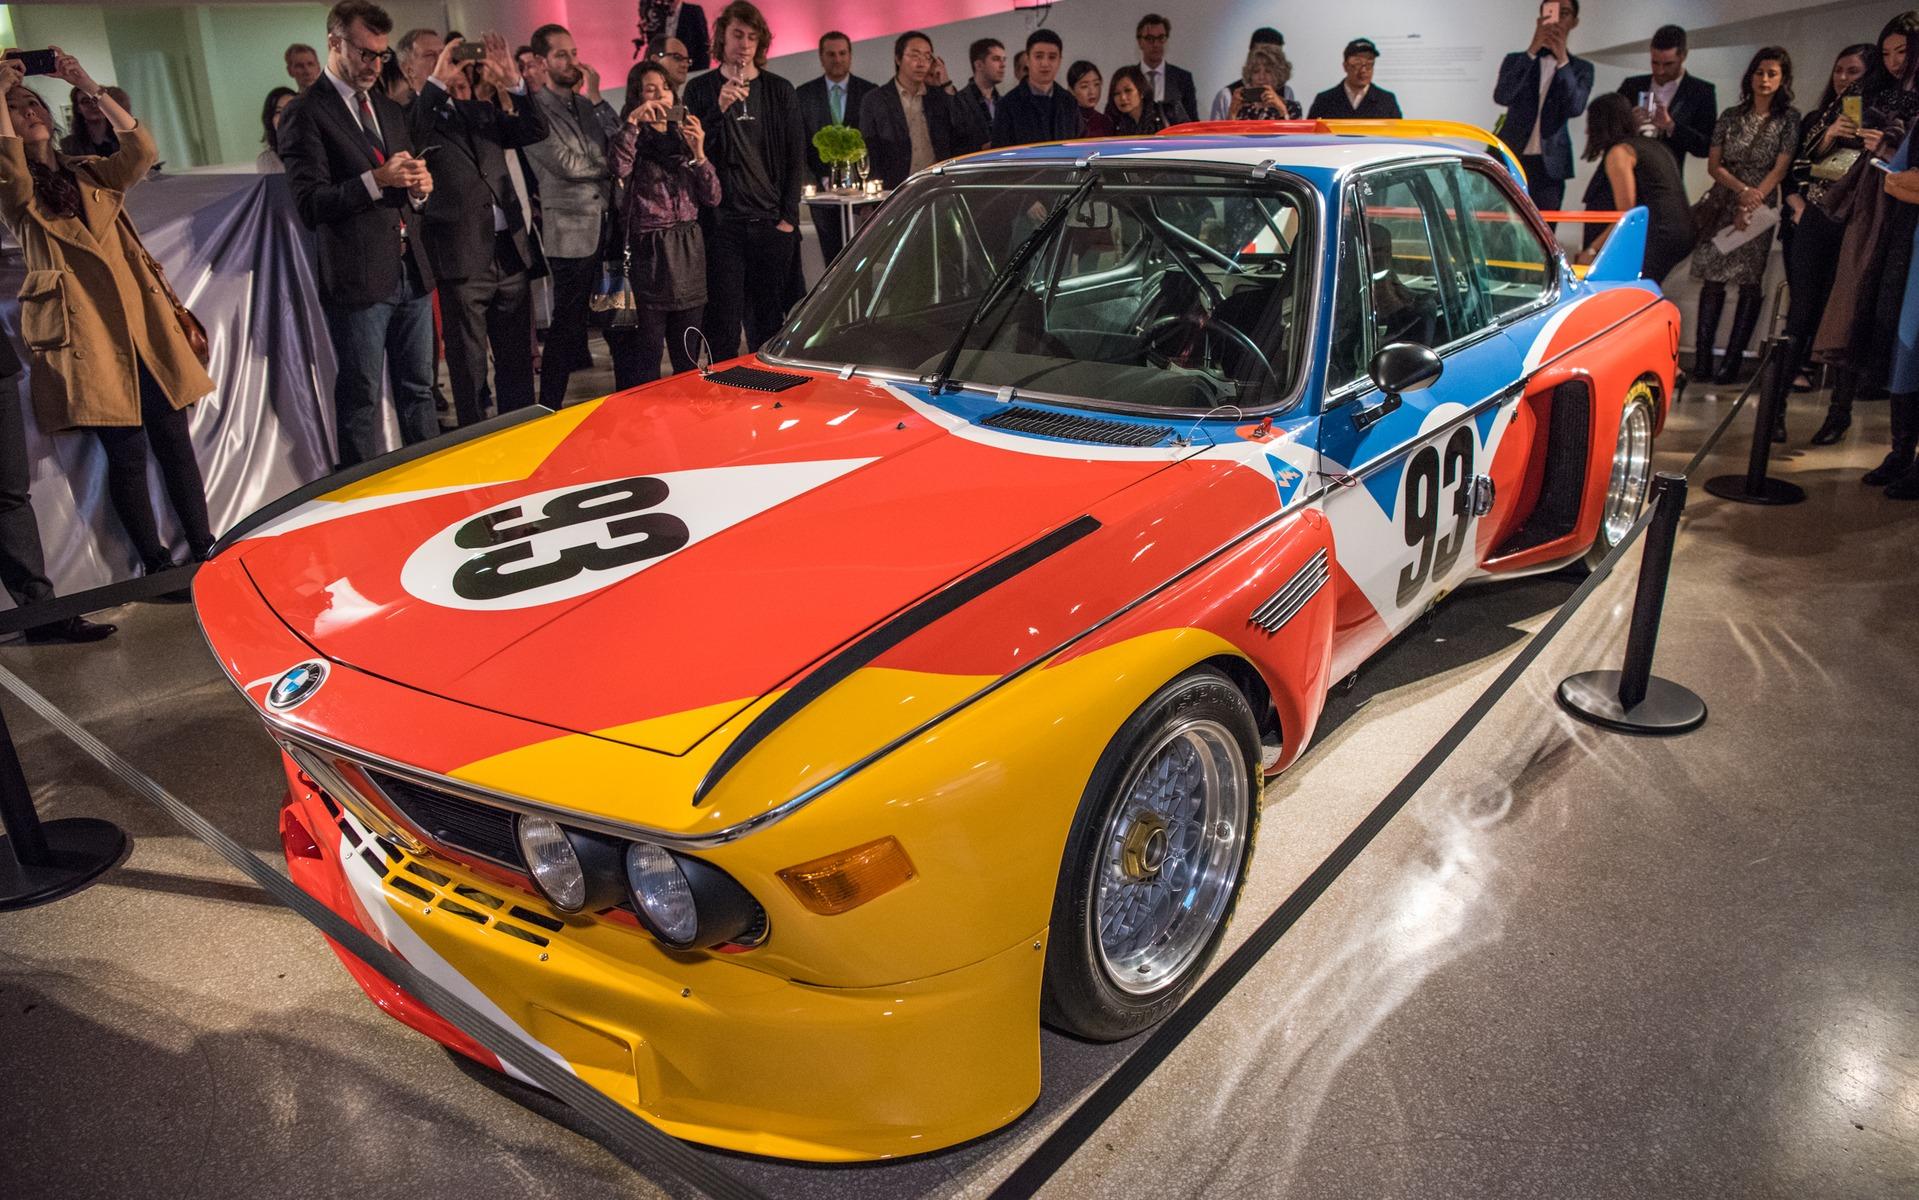 La BMW 3.0 CSL, la première des Art Cars